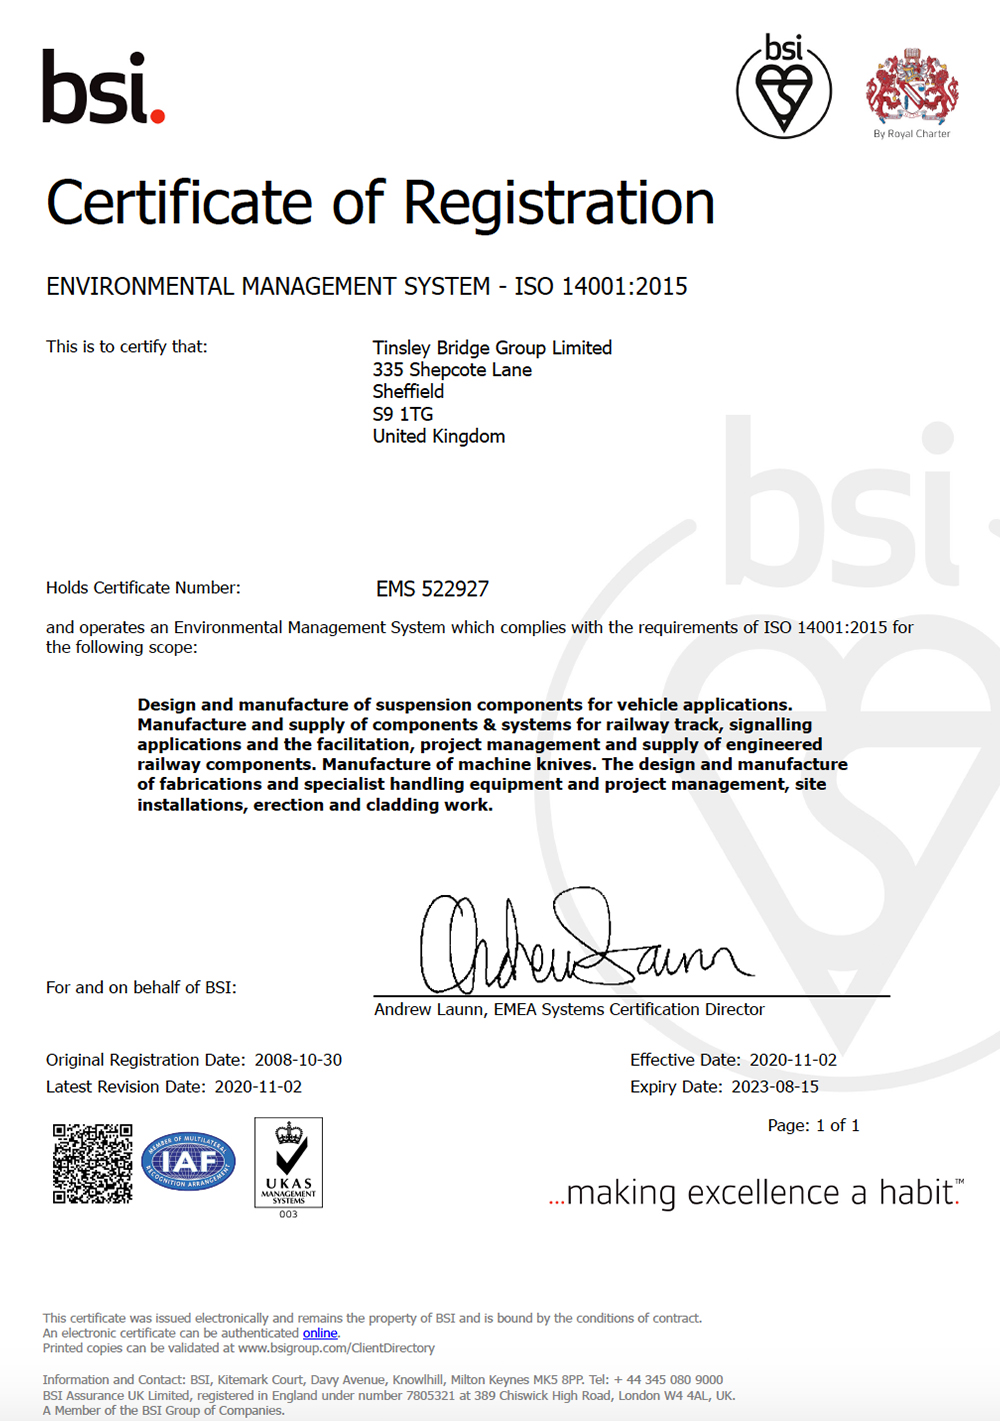 TBG - ISO 14001(2015) Environmental Management System Certificate - EMS 522927 - Valid until 15-08-2023